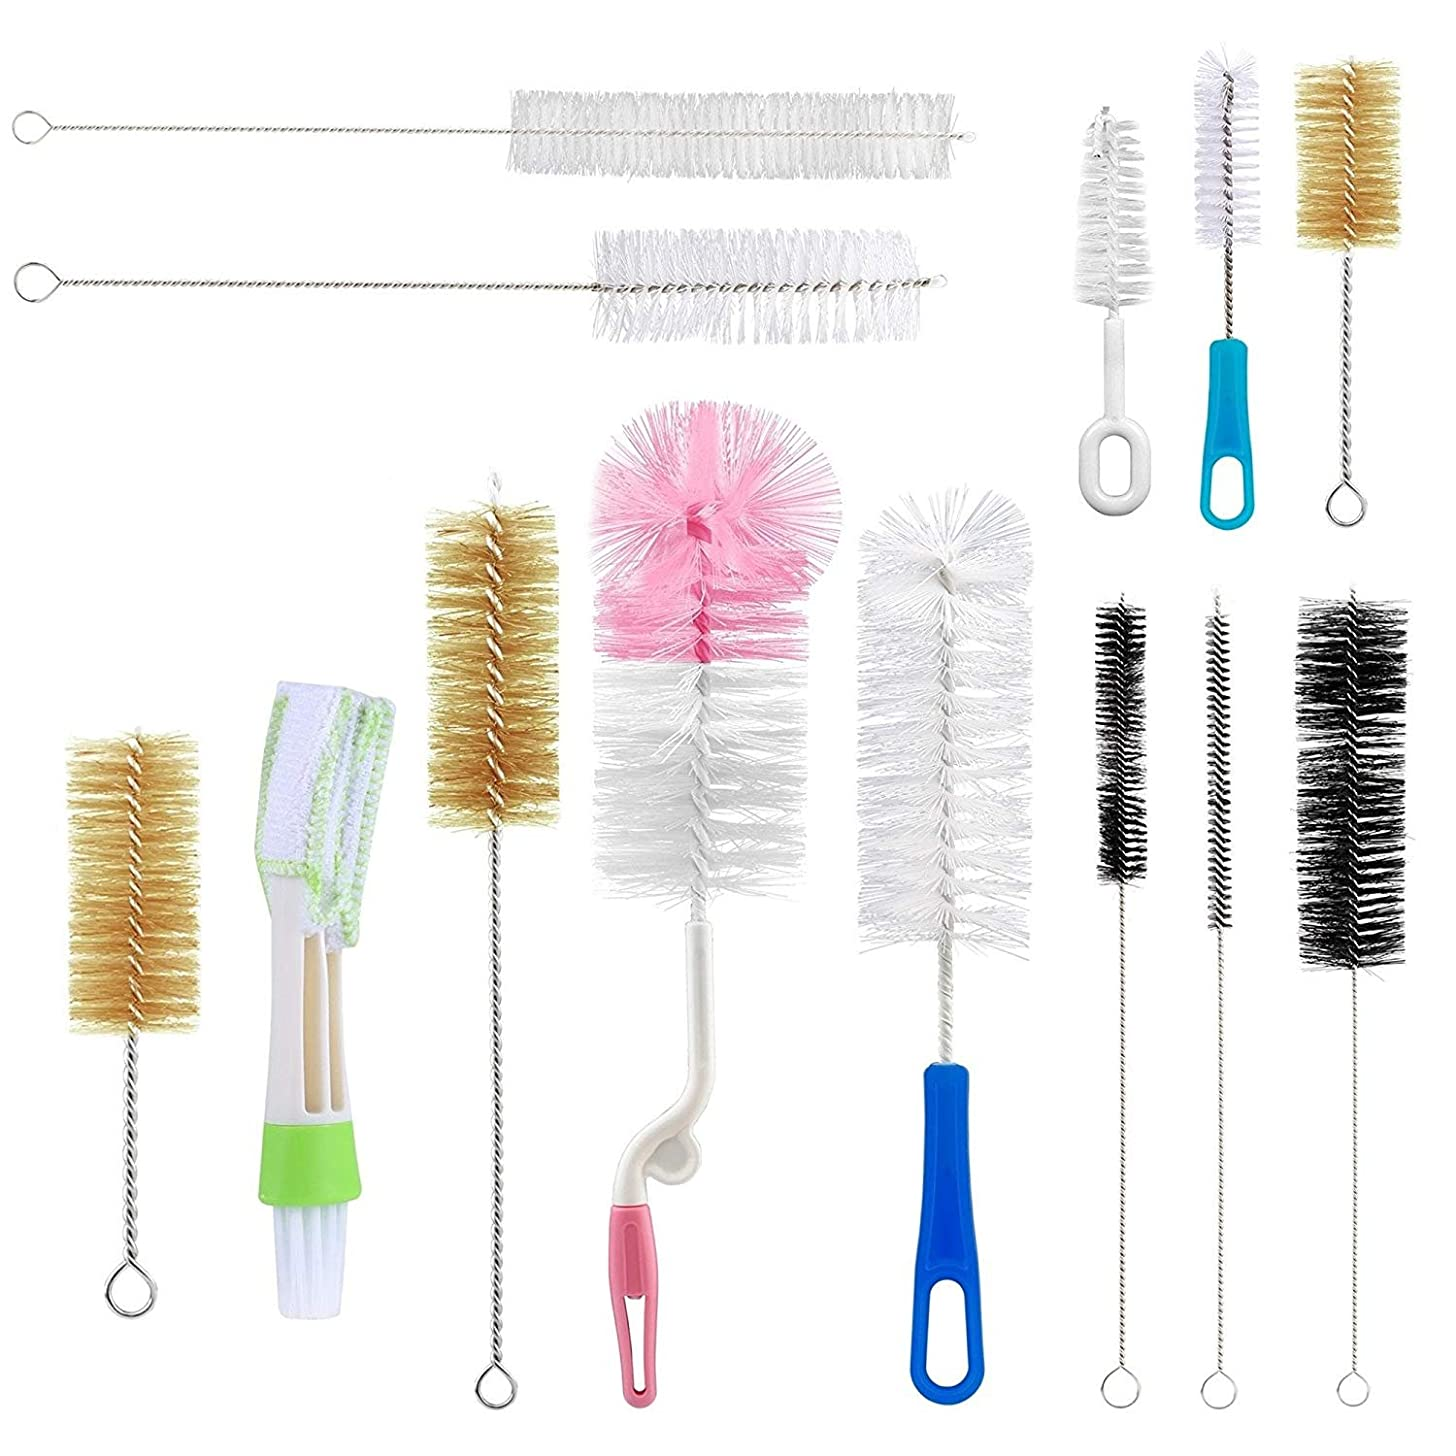 Yoassi 13Pcs Food Grade Multipurpose Cleaning Set Includes Straw, Nipple Brush,Blind Duster,Pipe Cleaner,Small,Long,Soft,Stiff Kit for Baby Bottles,Tubes,Jars,Bird Feeder